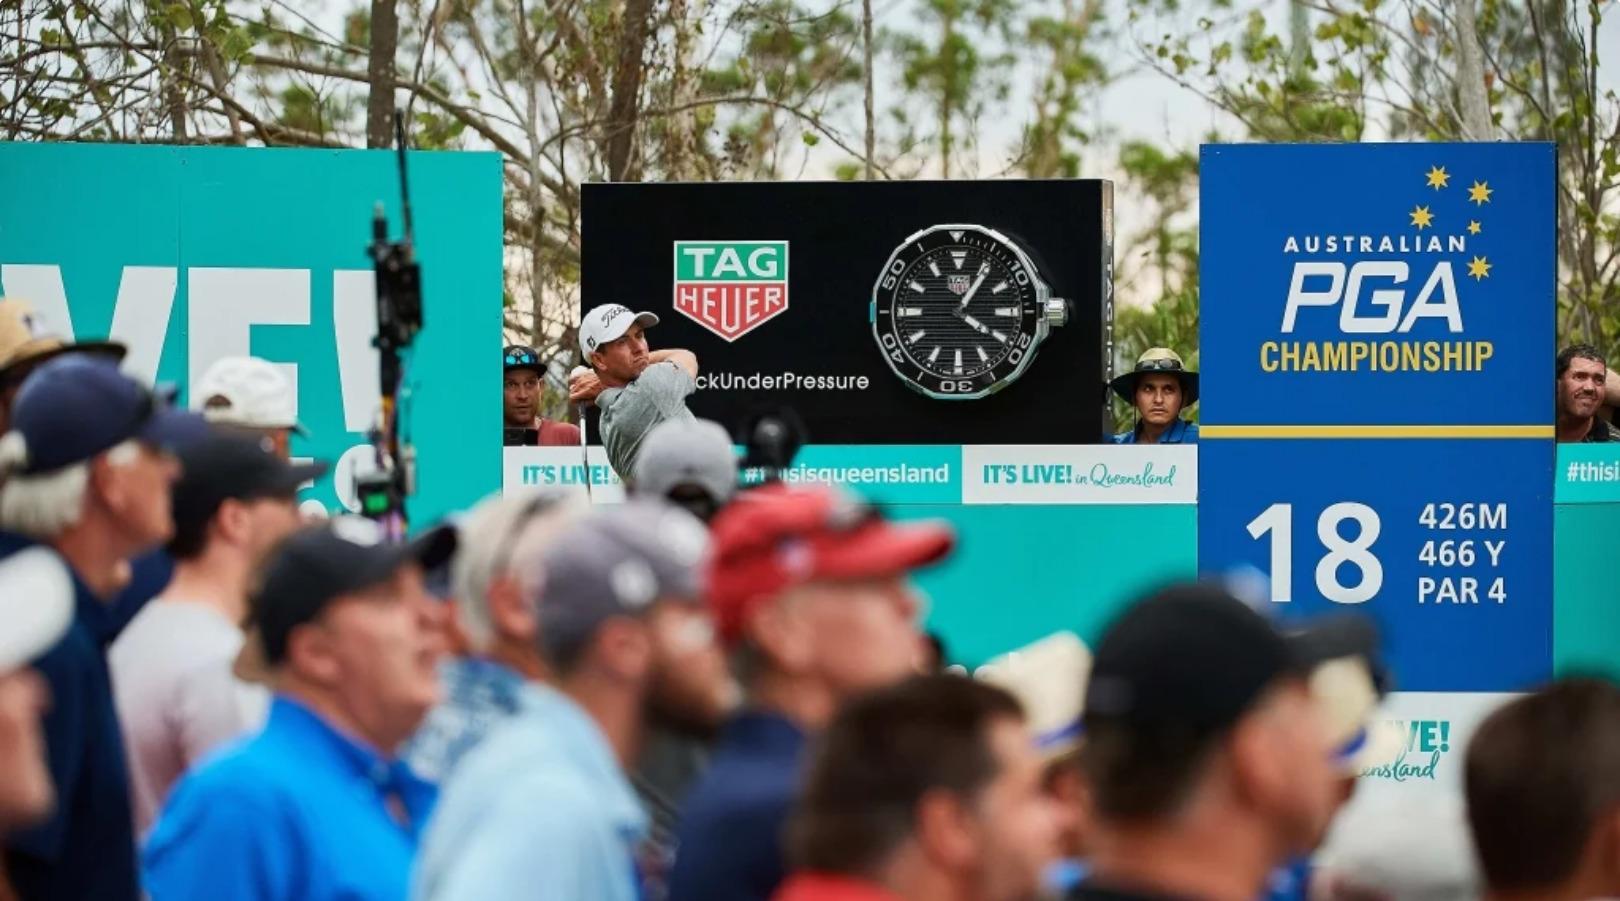 PGA media partnerships